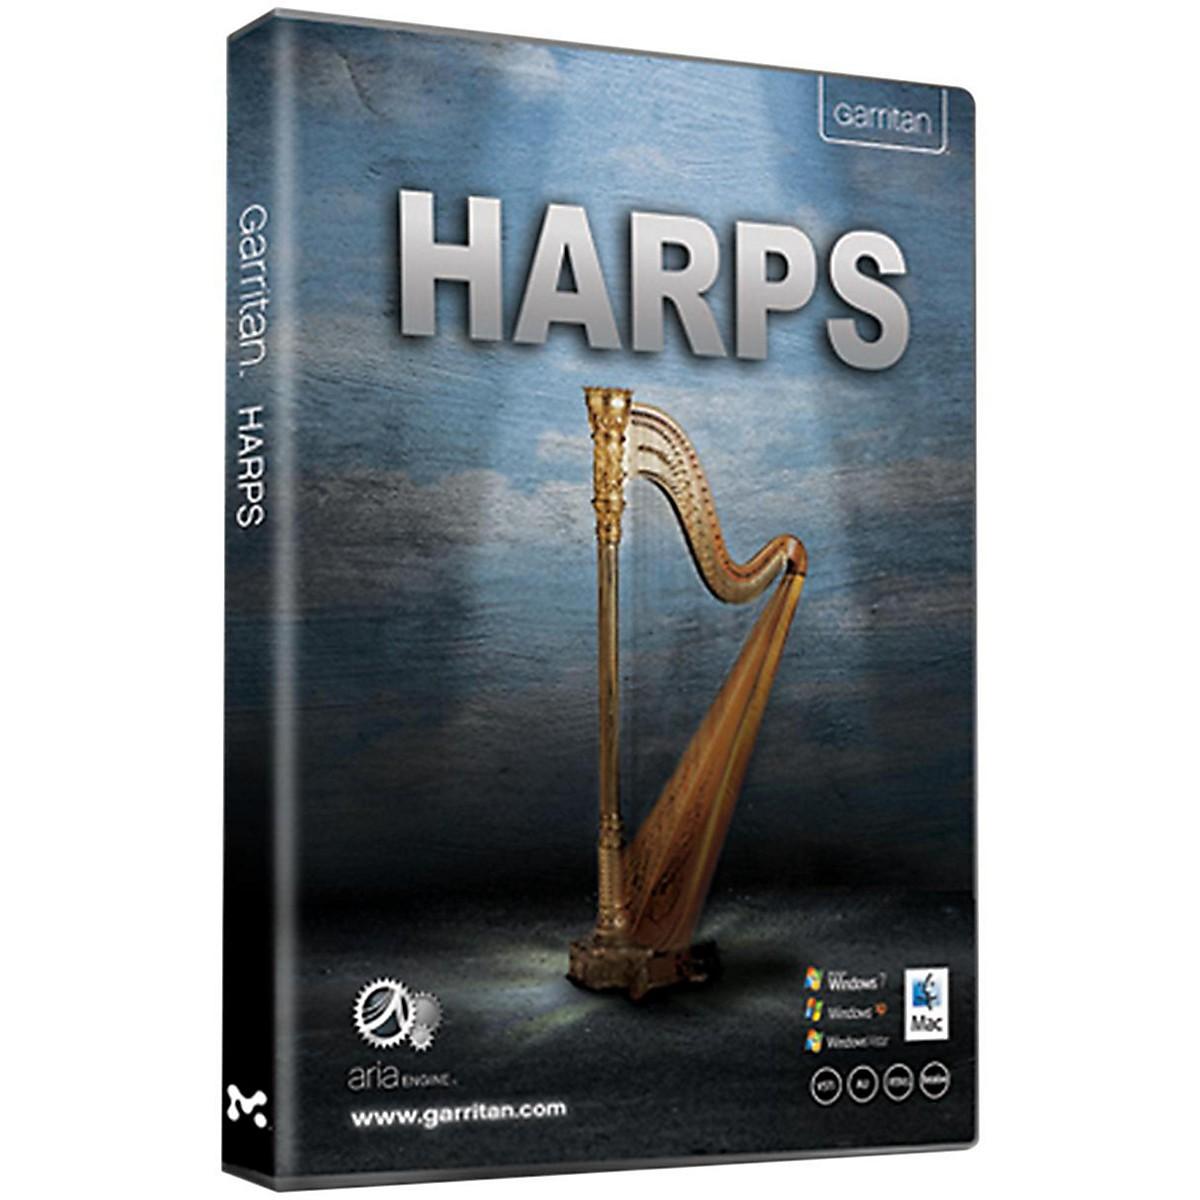 Garritan Harps Software Download